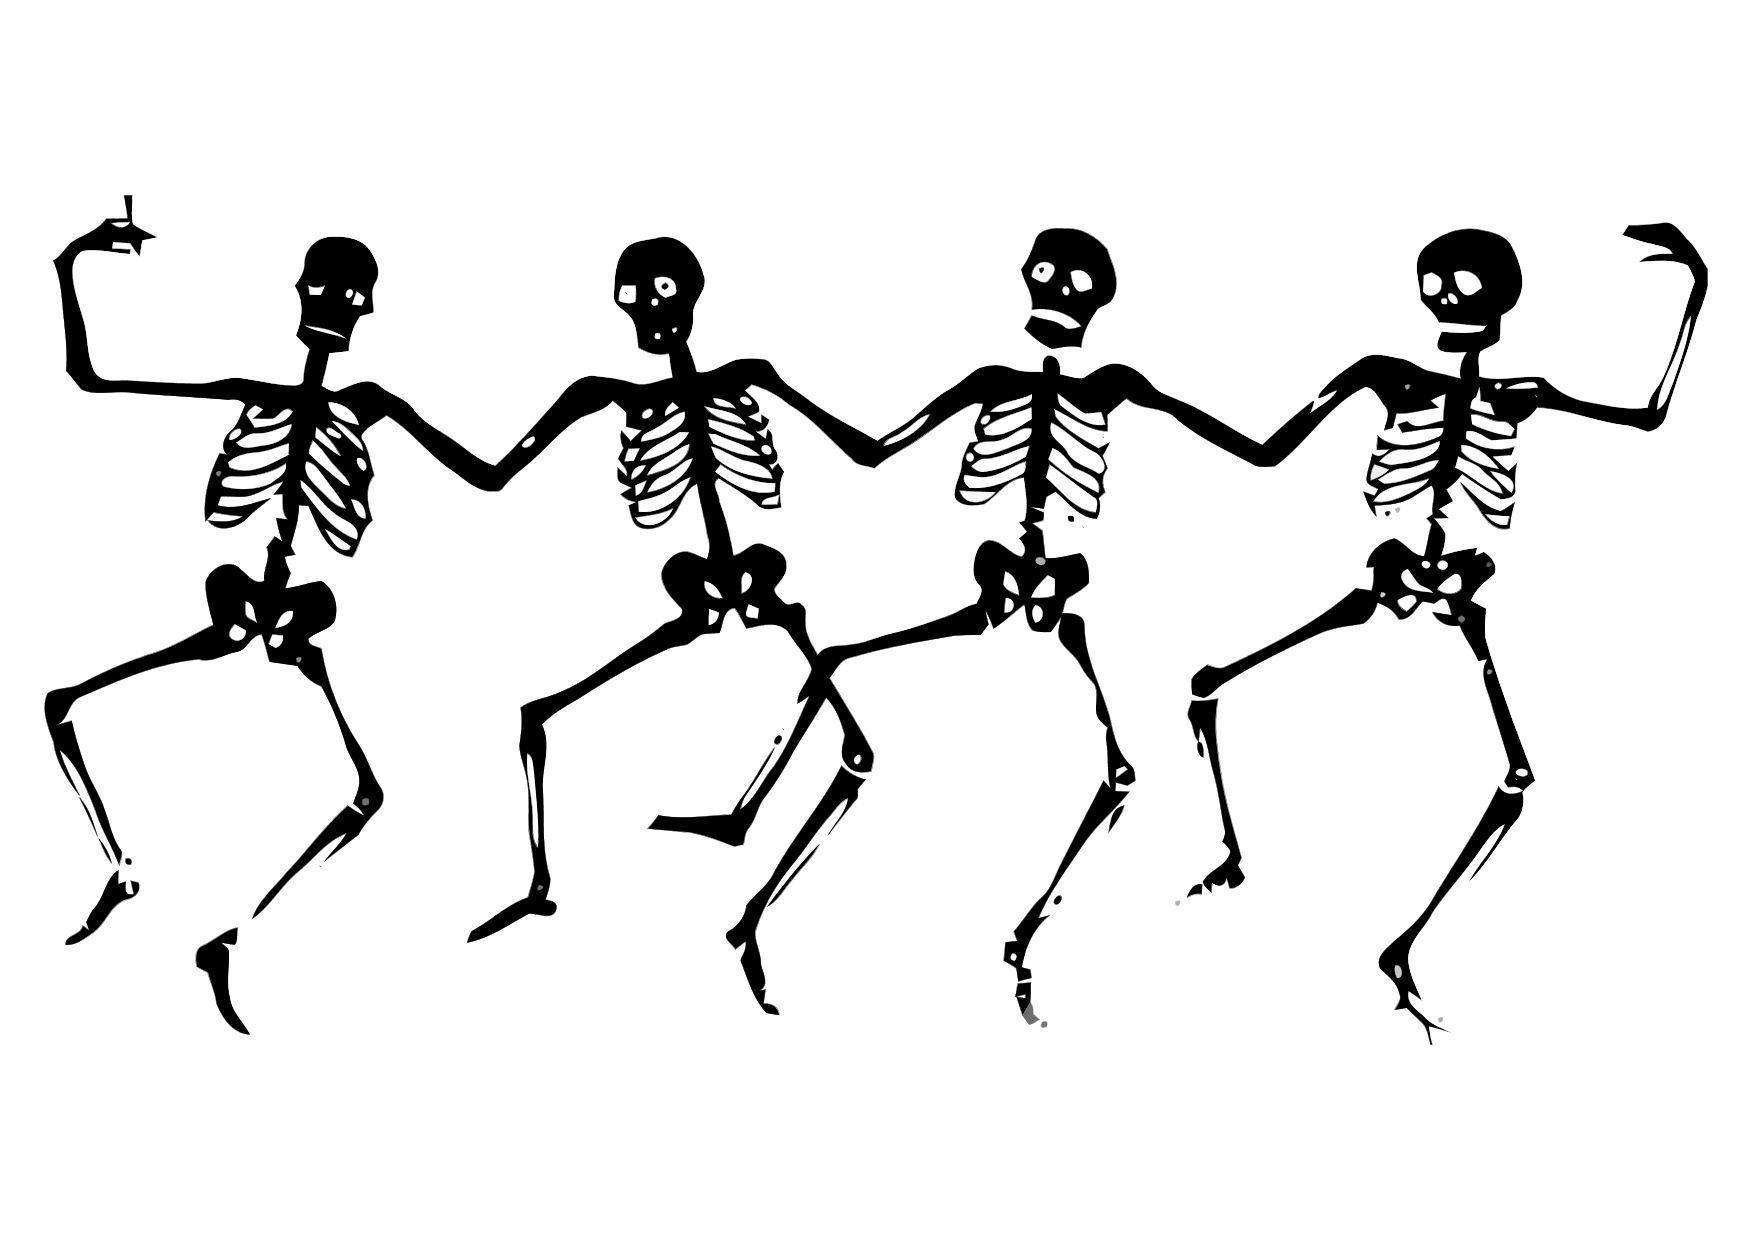 Dibujo para colorear Esqueletos bailando - Img 11310